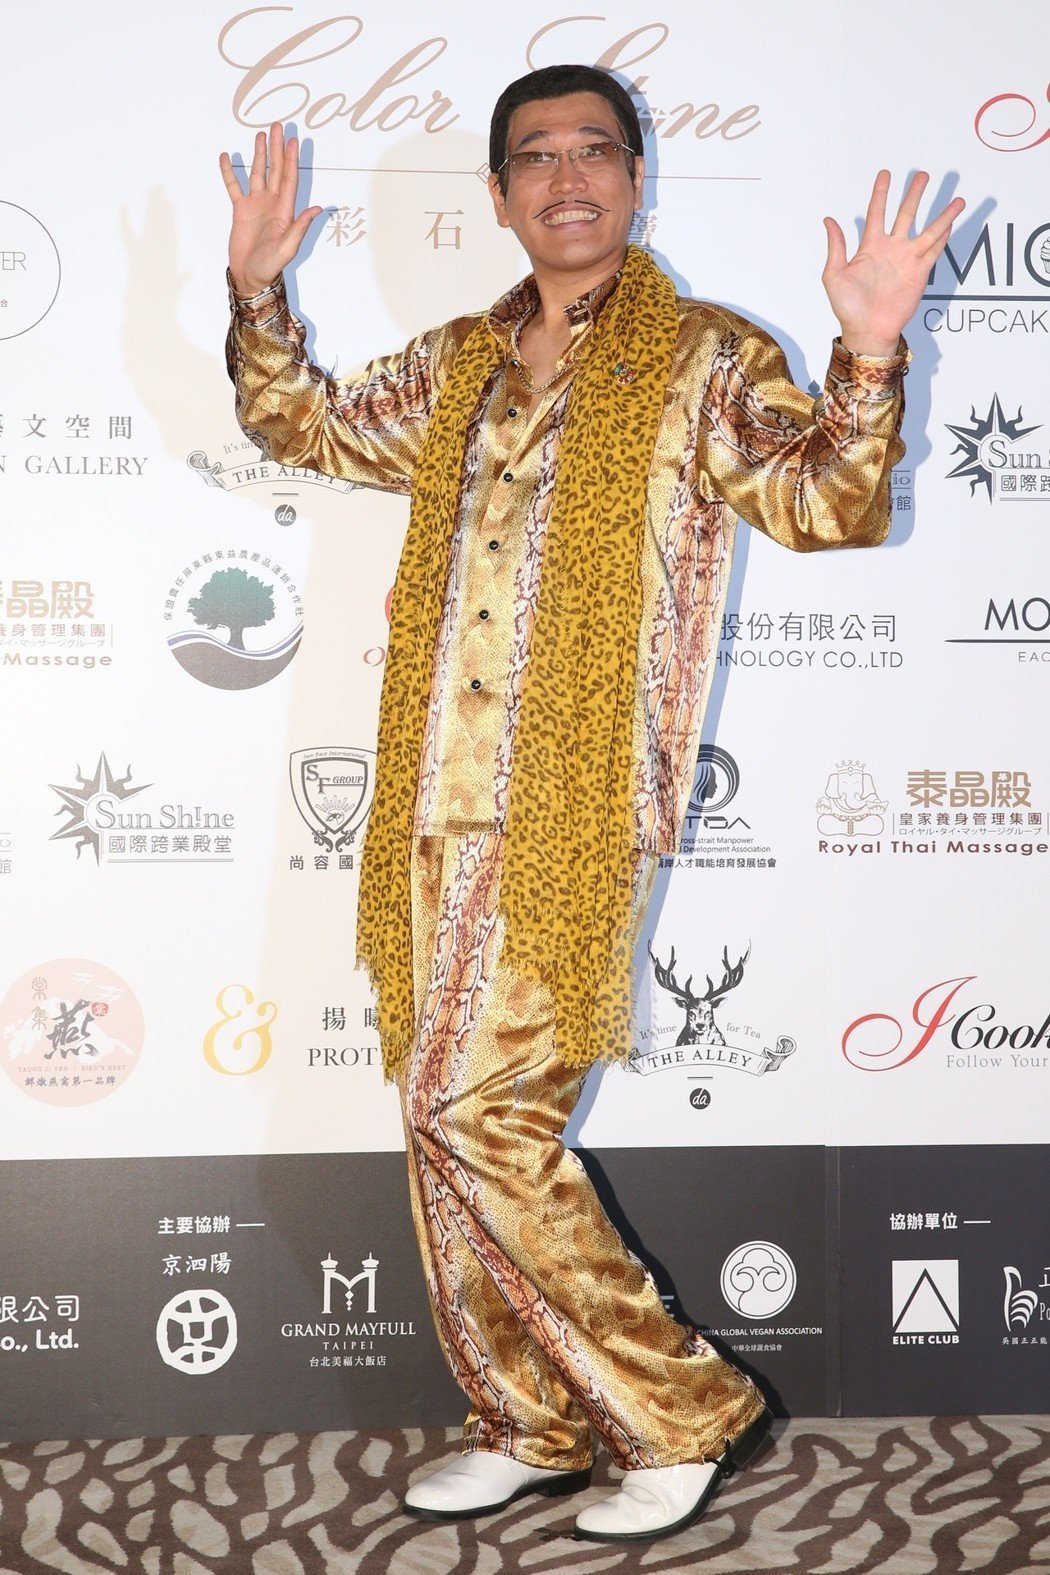 PIKO太郎出席亞太影展彩石之夜,並表示他很喜歡台灣。記者葉信菉/攝影